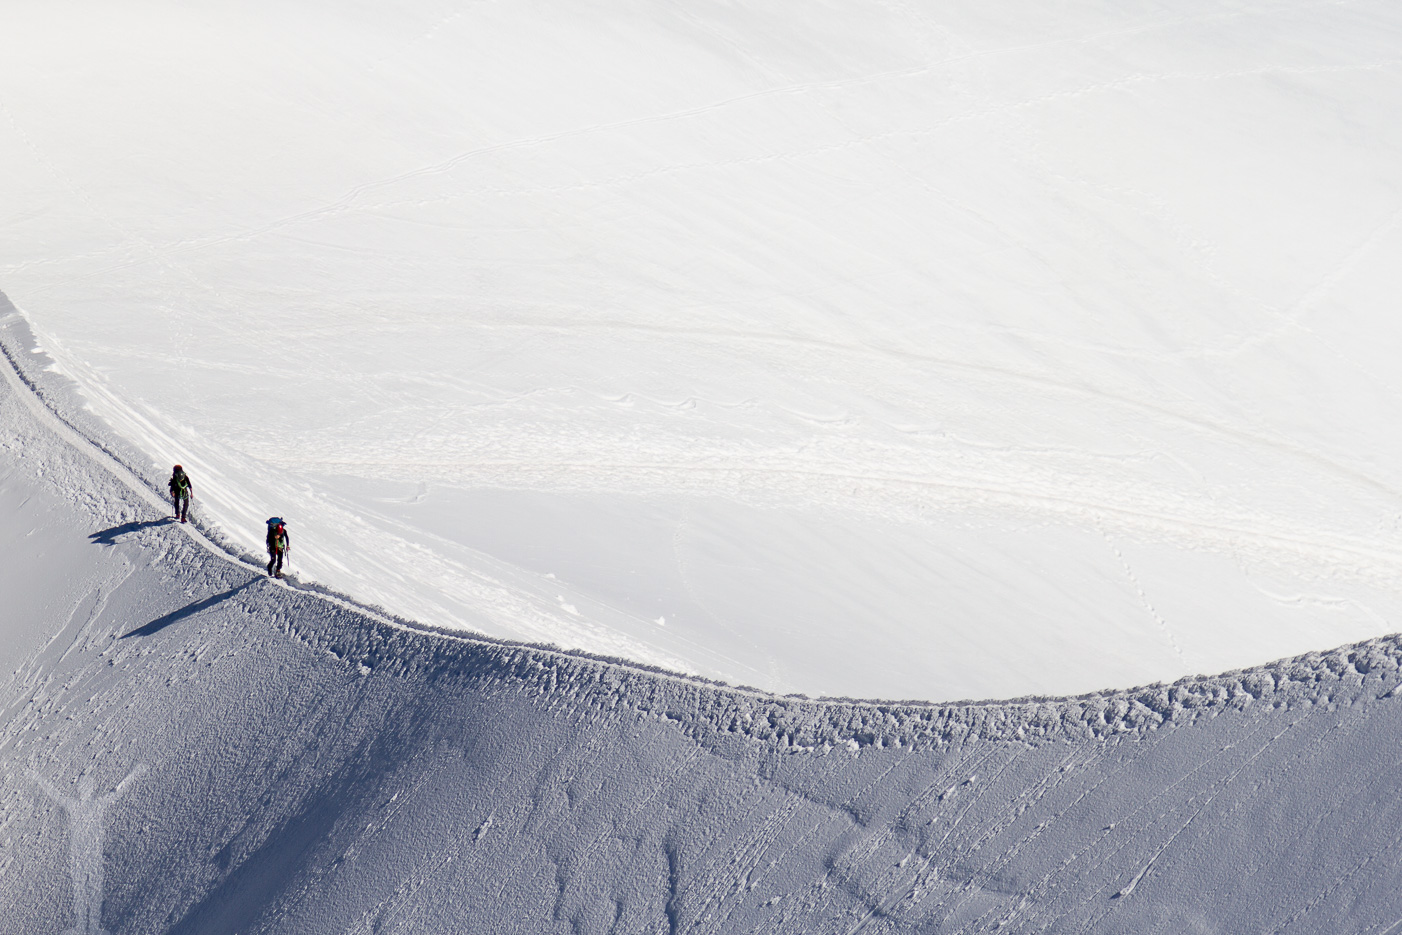 Bergsbestigare på Aiguille du Midi